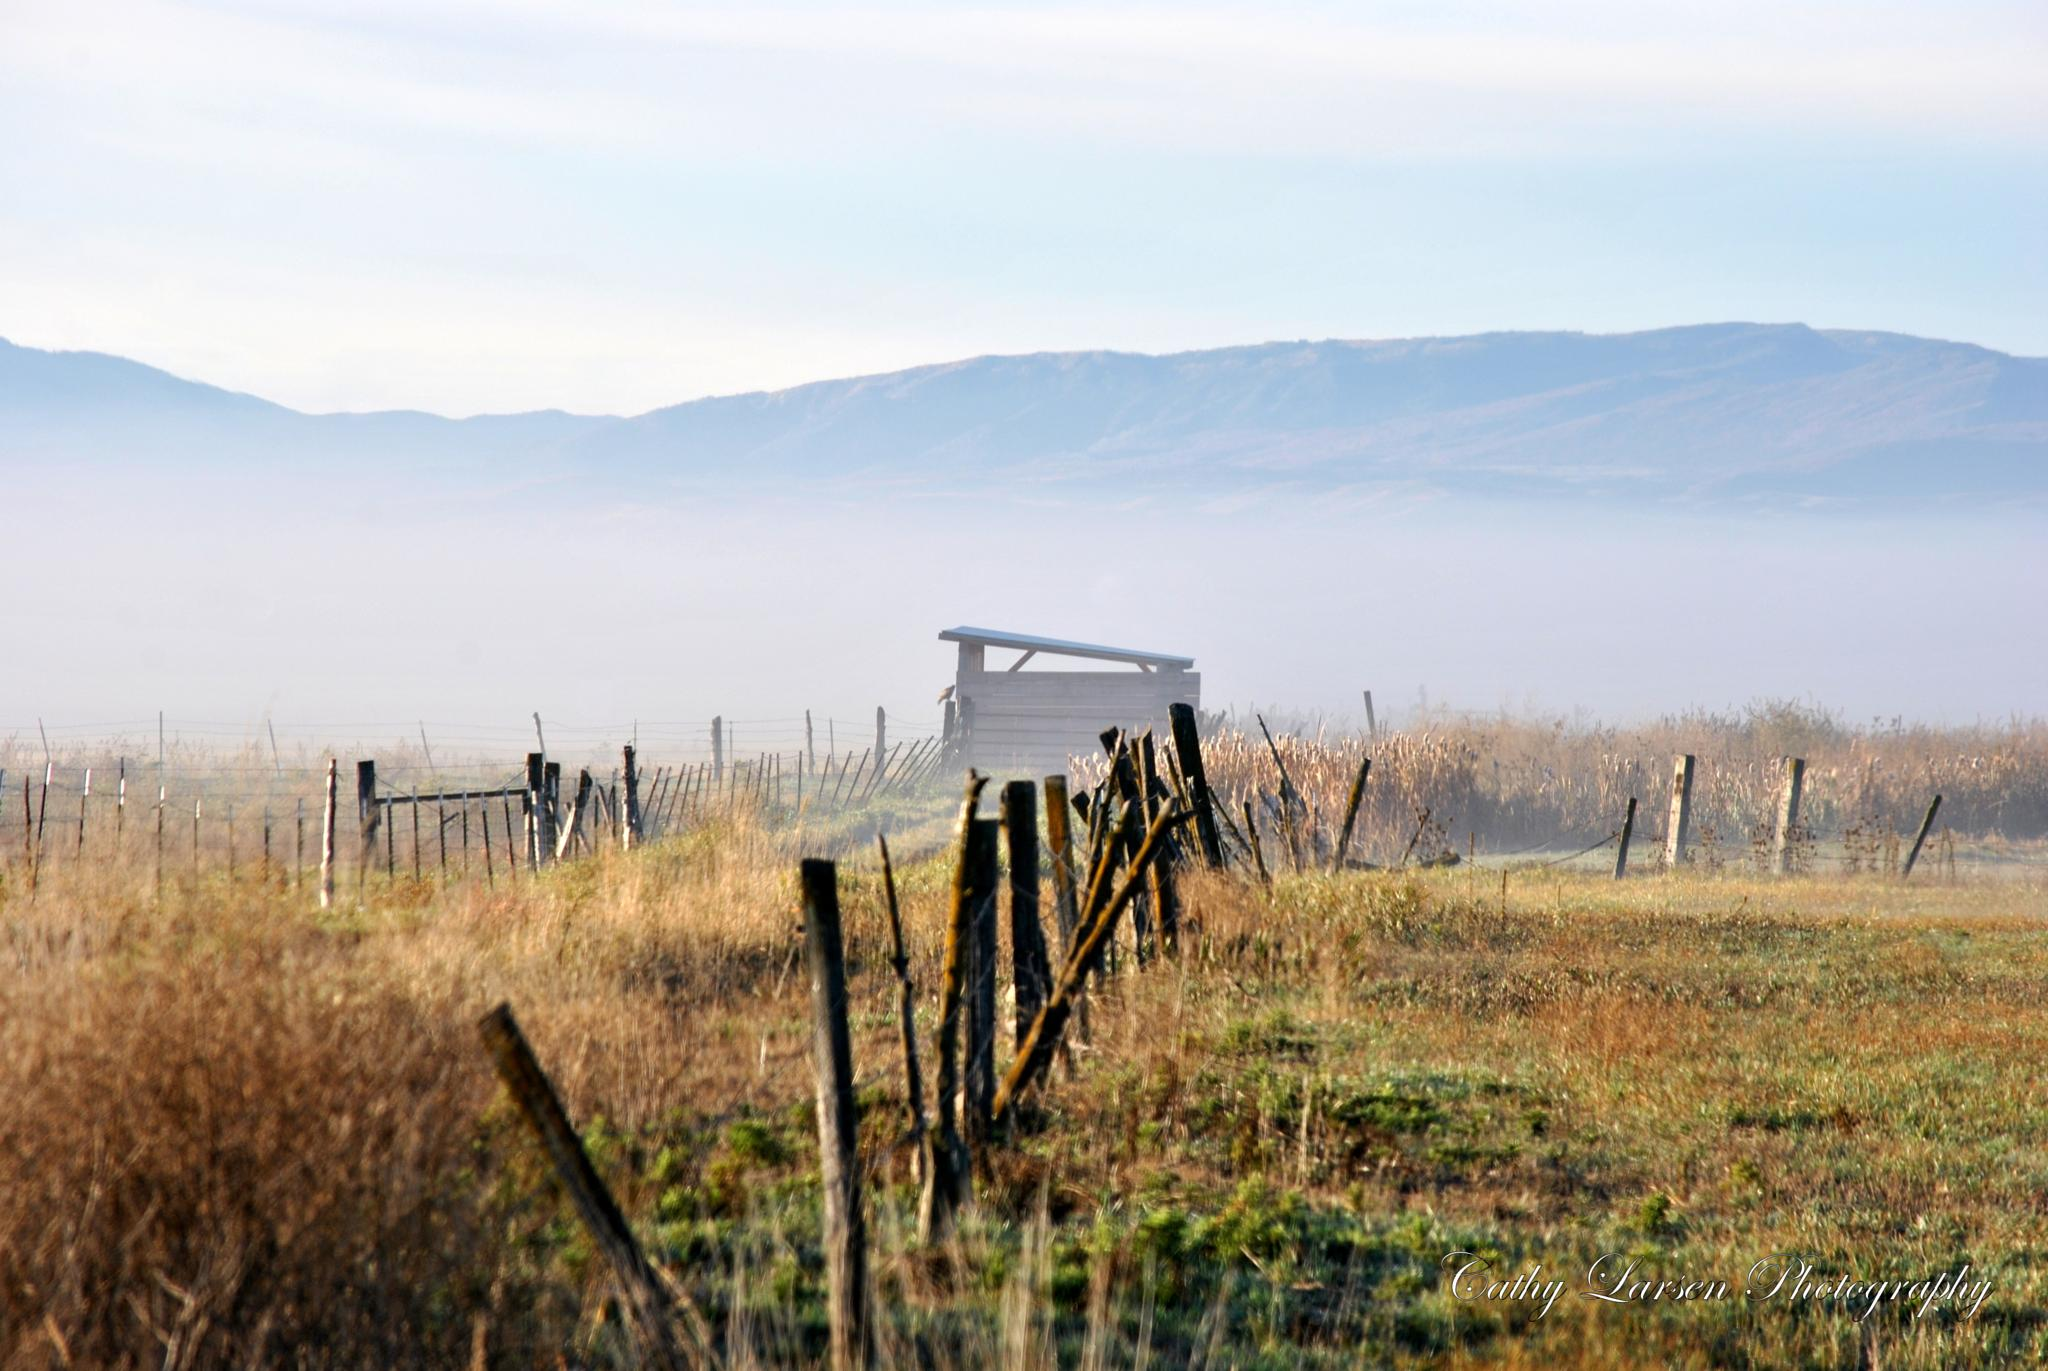 Foggy Morning by crlarsen